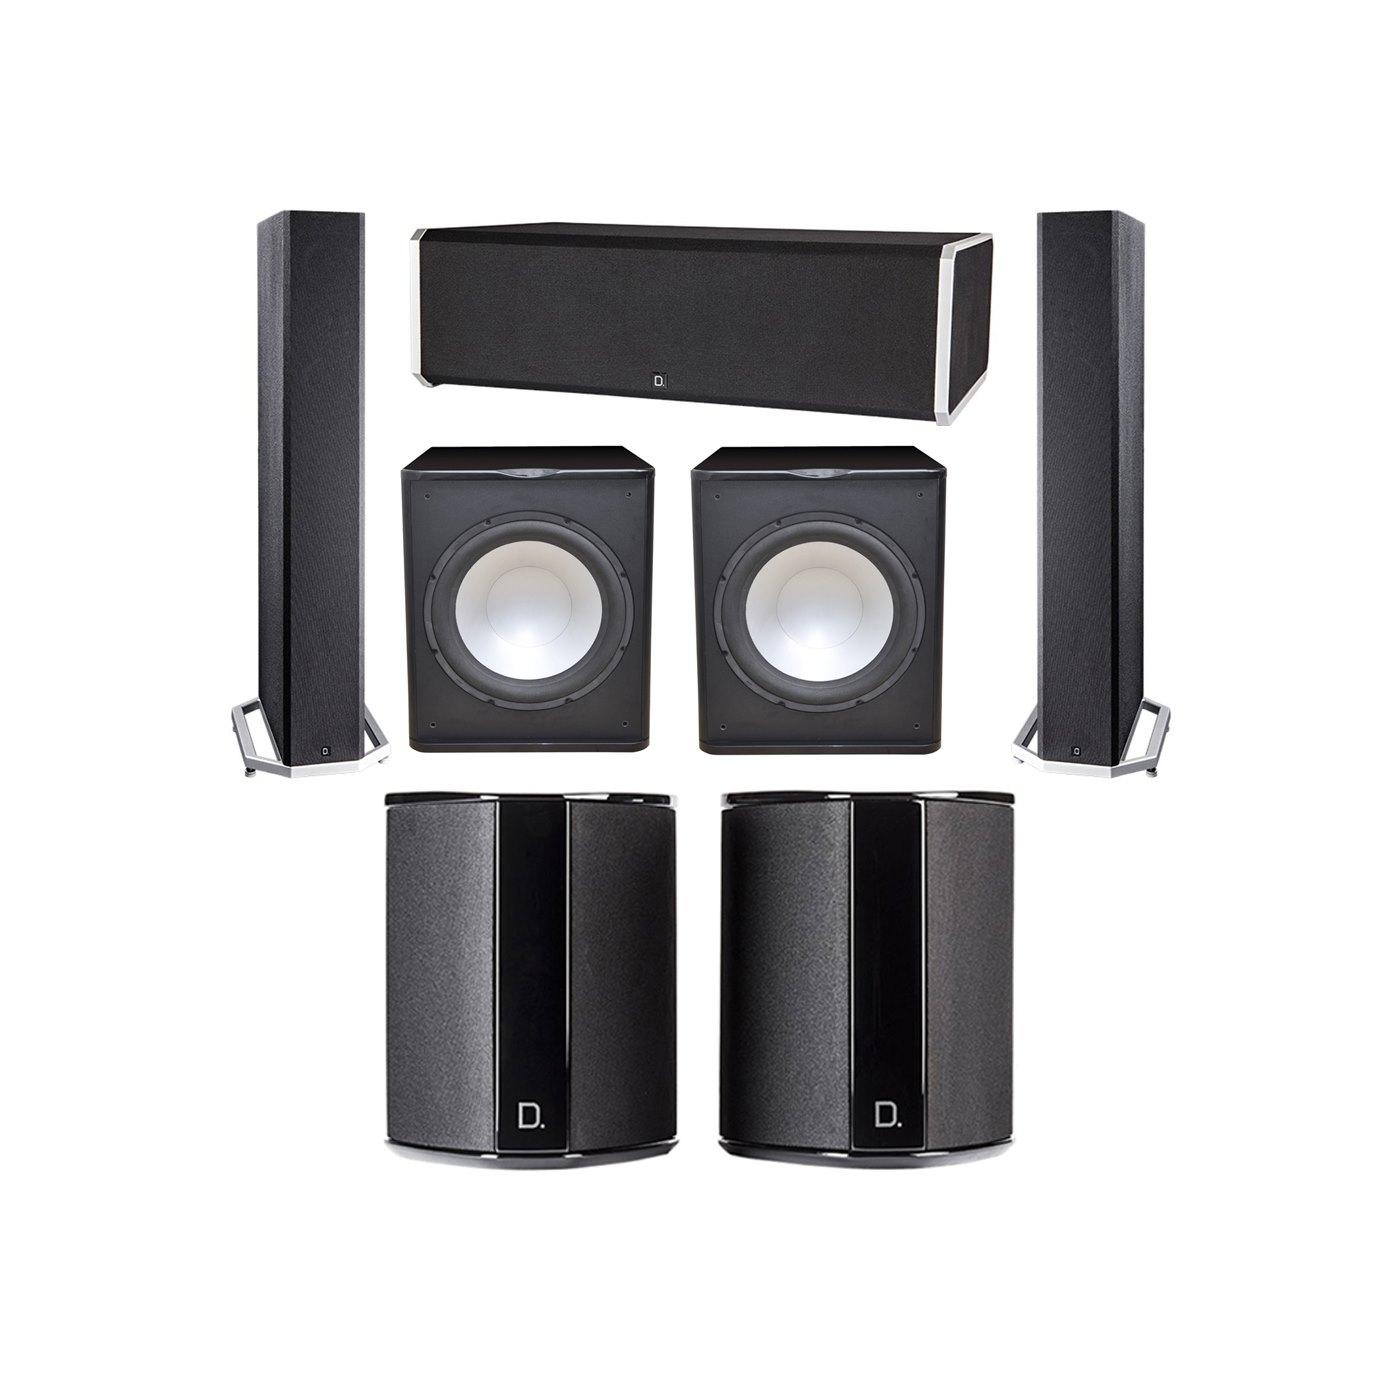 Definitive Technology 5.2 System with 2 BP9040 Tower Speakers, 1 CS9080 Center Channel Speaker, 2 SR9040 Surround Speaker, 2 Premier Acoustic PA-150 Subwoofer